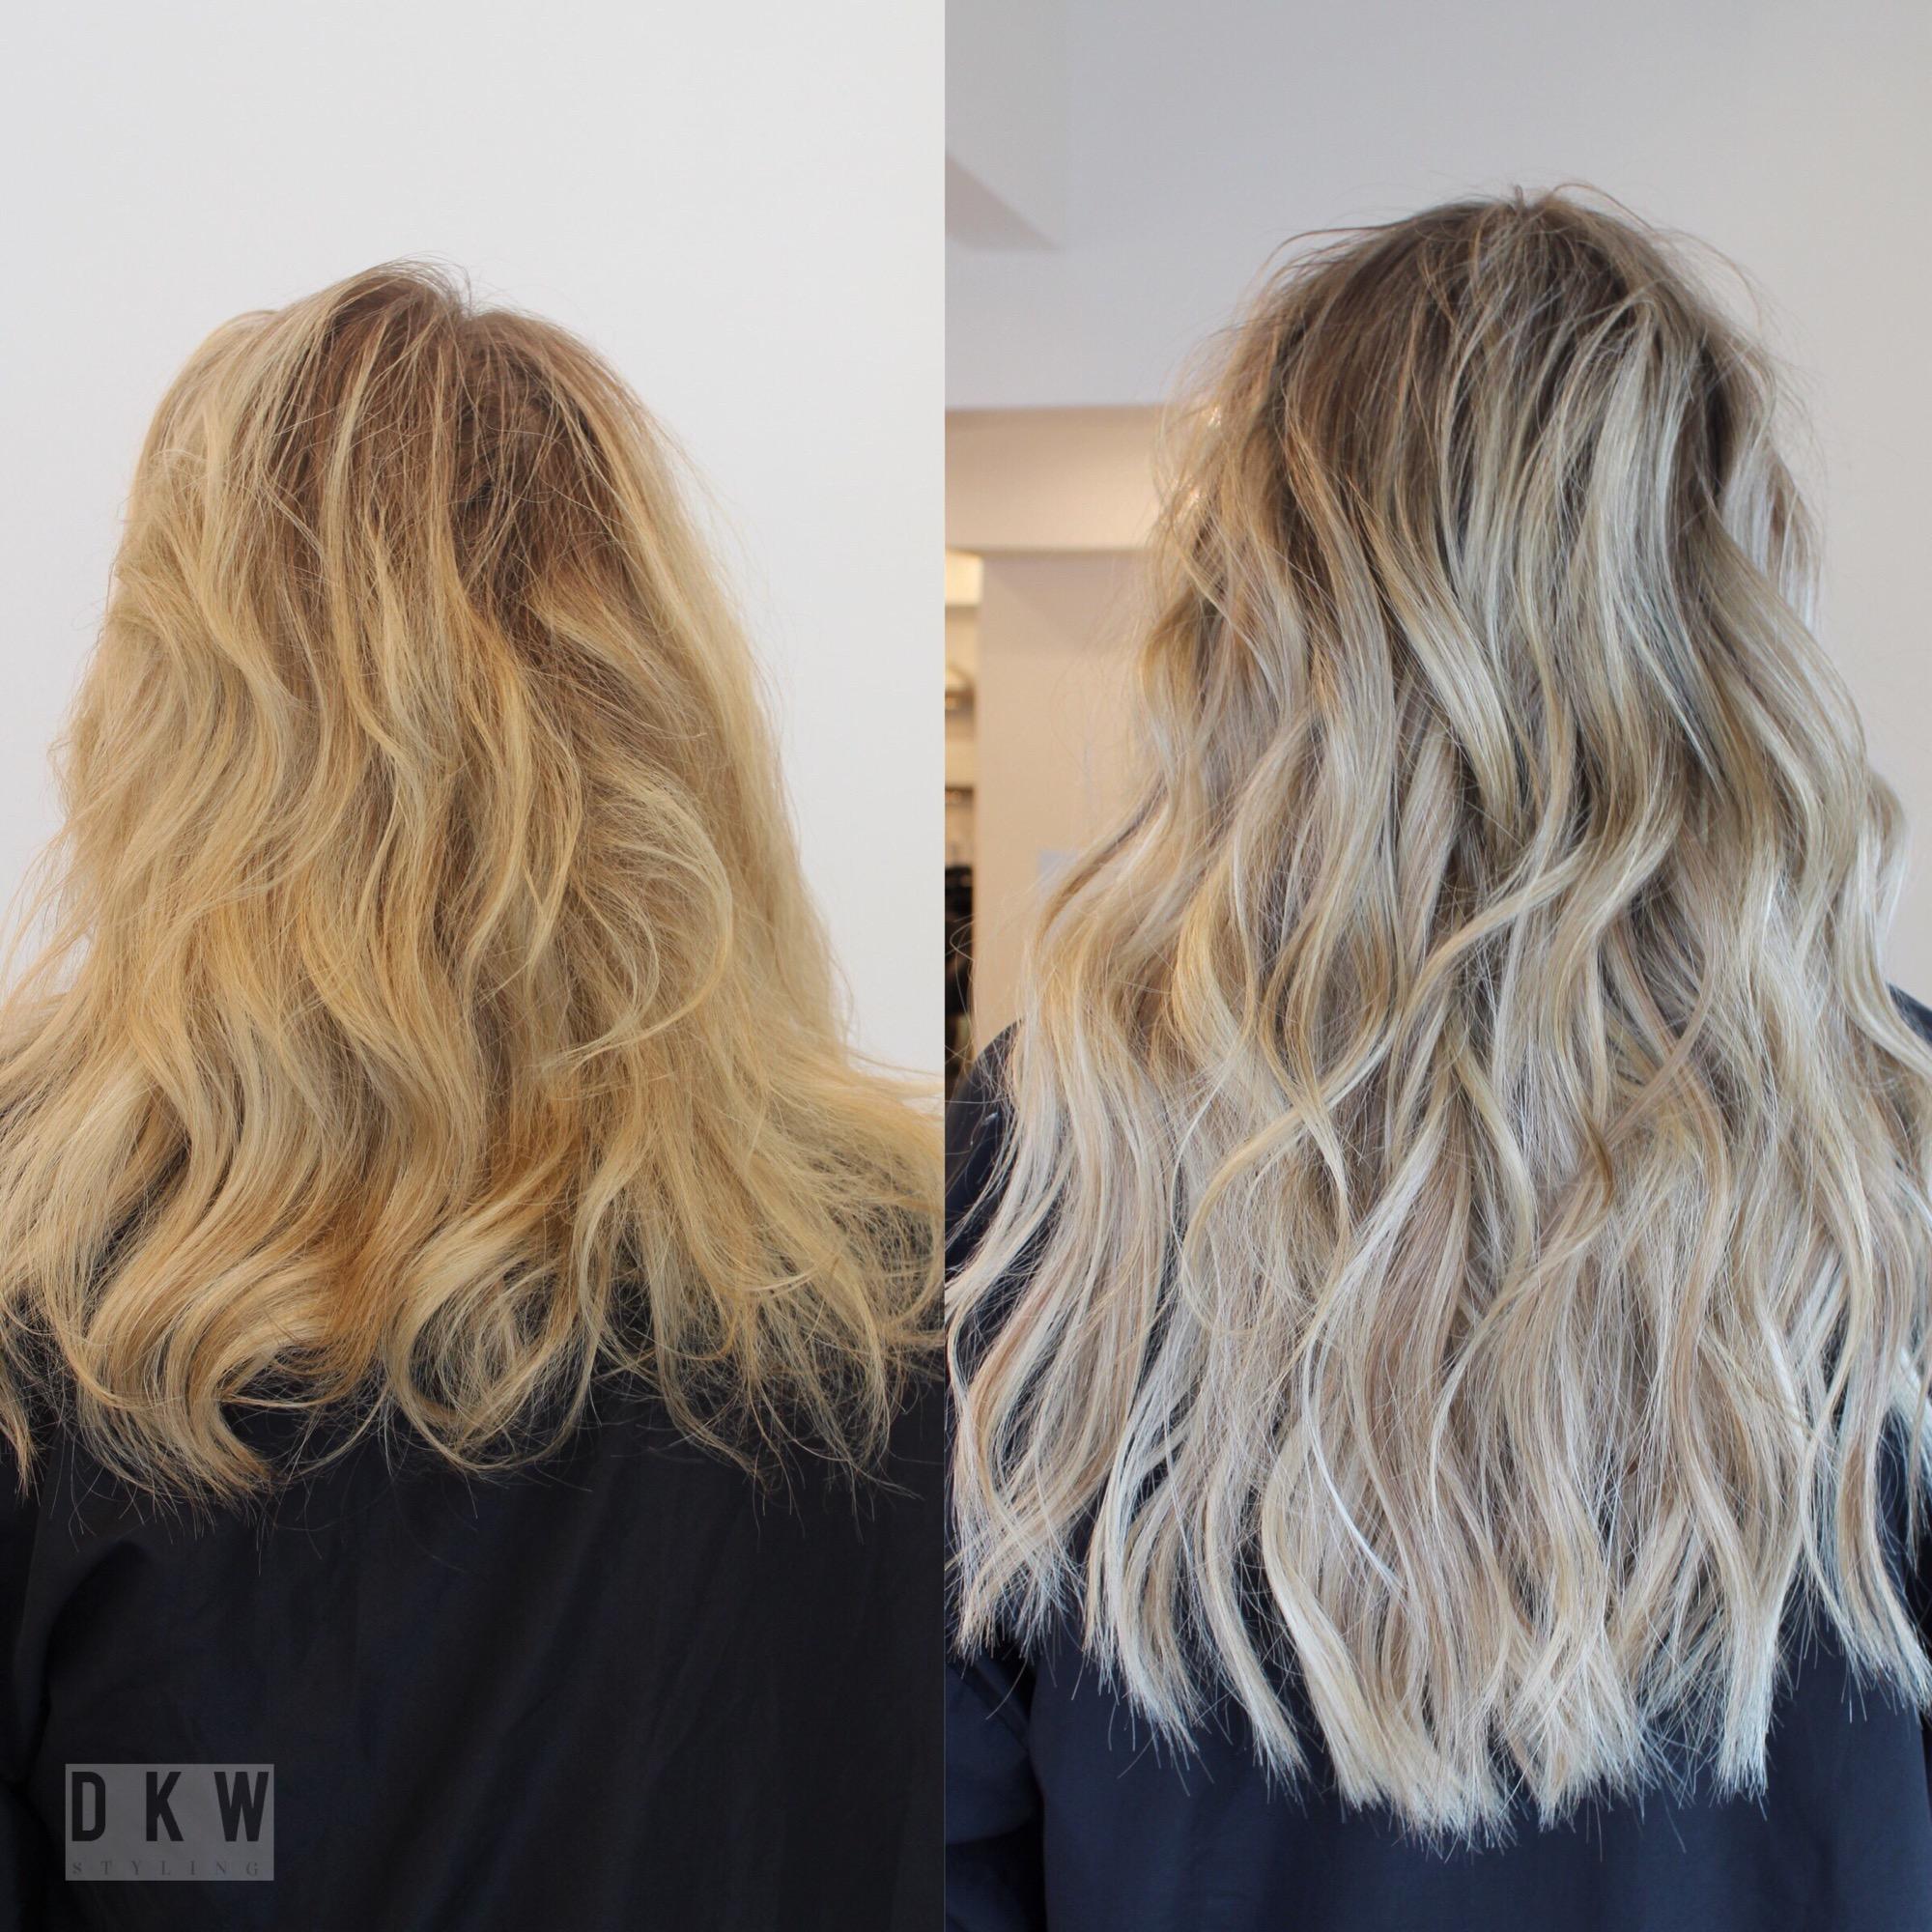 NBR Hair Extensions by Danielle K. White